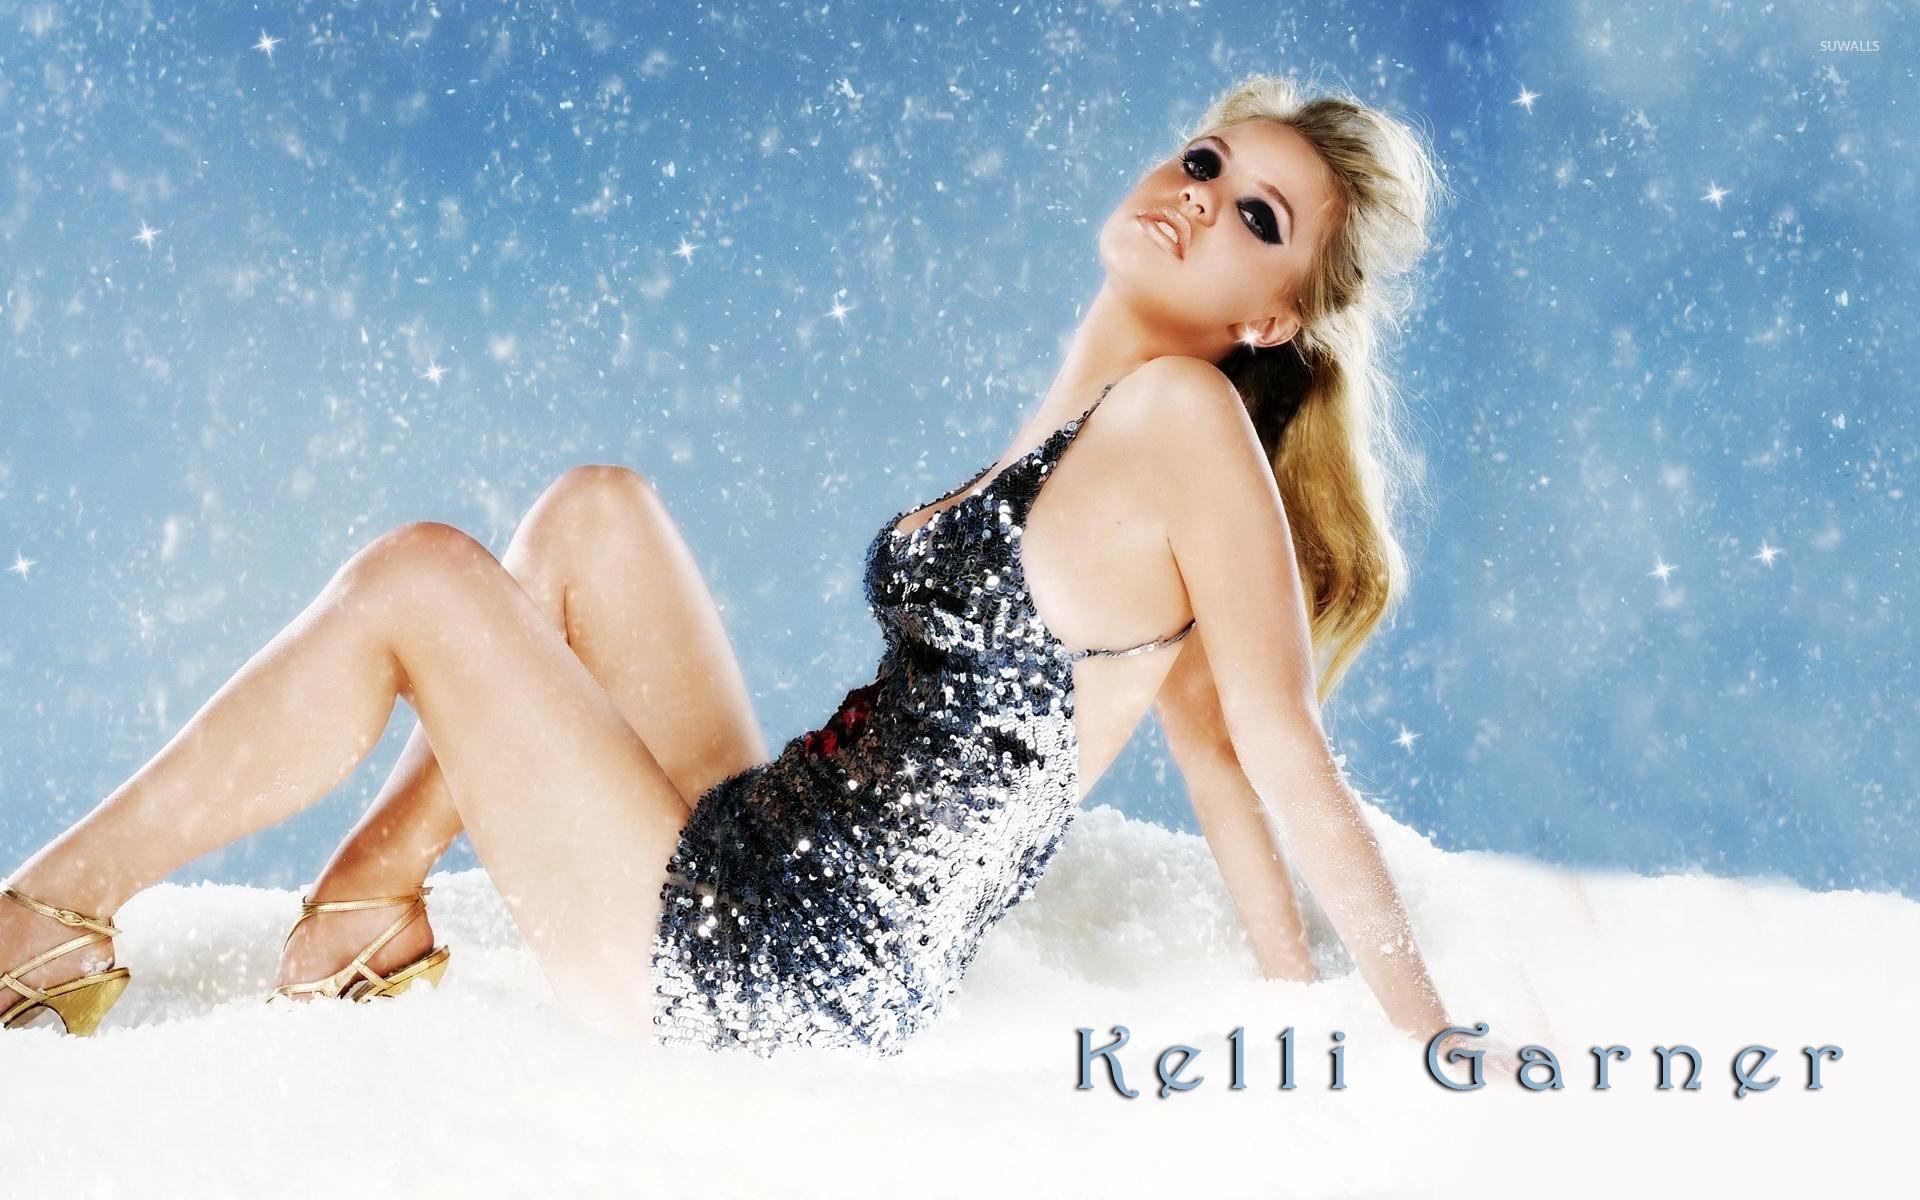 Celebrity Kelli Garner nudes (24 photos), Ass, Leaked, Instagram, swimsuit 2020